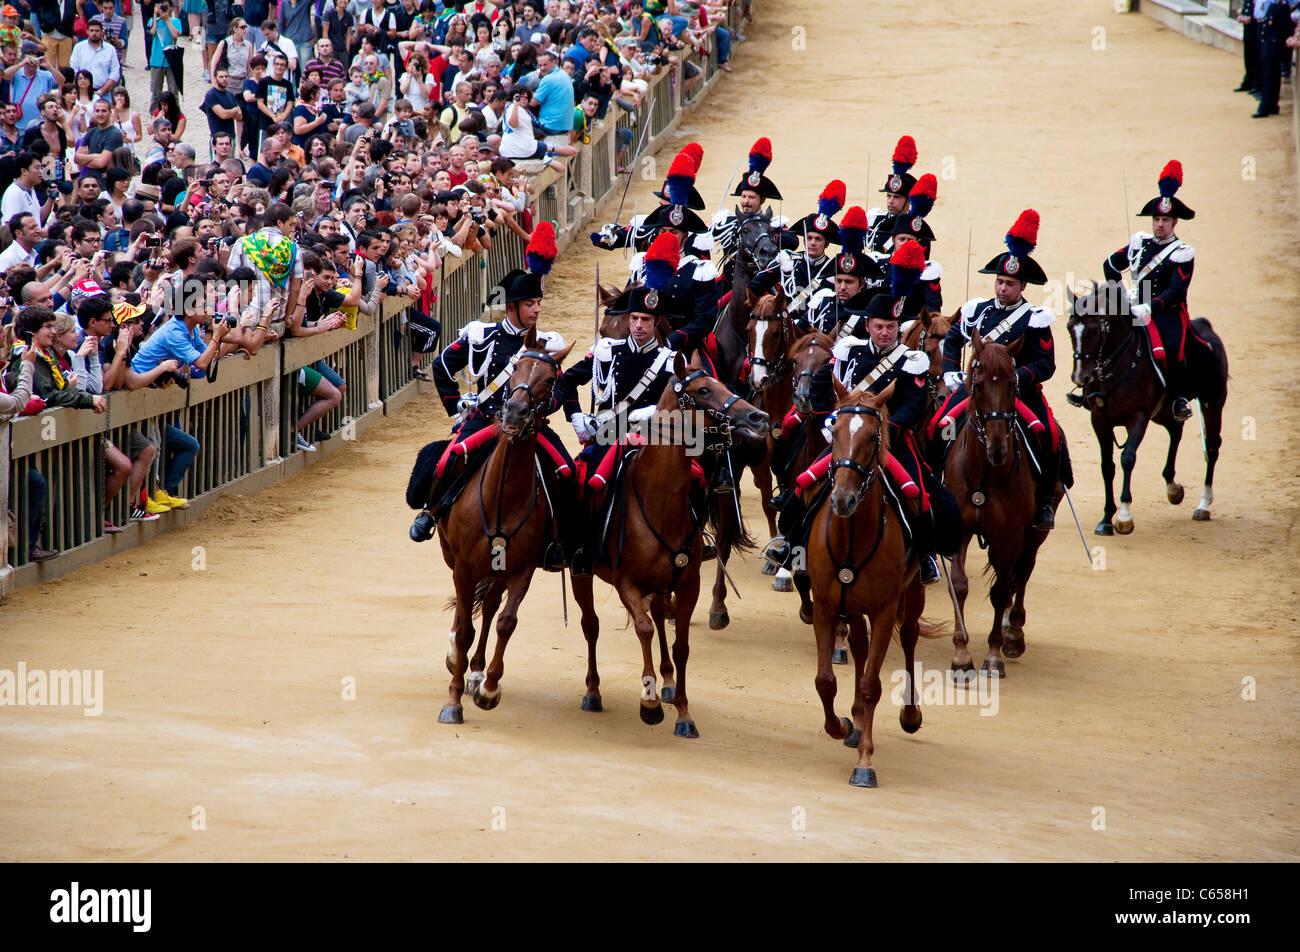 Palio di Siena 2011, July 2. Italian army, Carabinieri; cavalry charge, Piazza del Campo, Palio Siena. Editorial - Stock Image